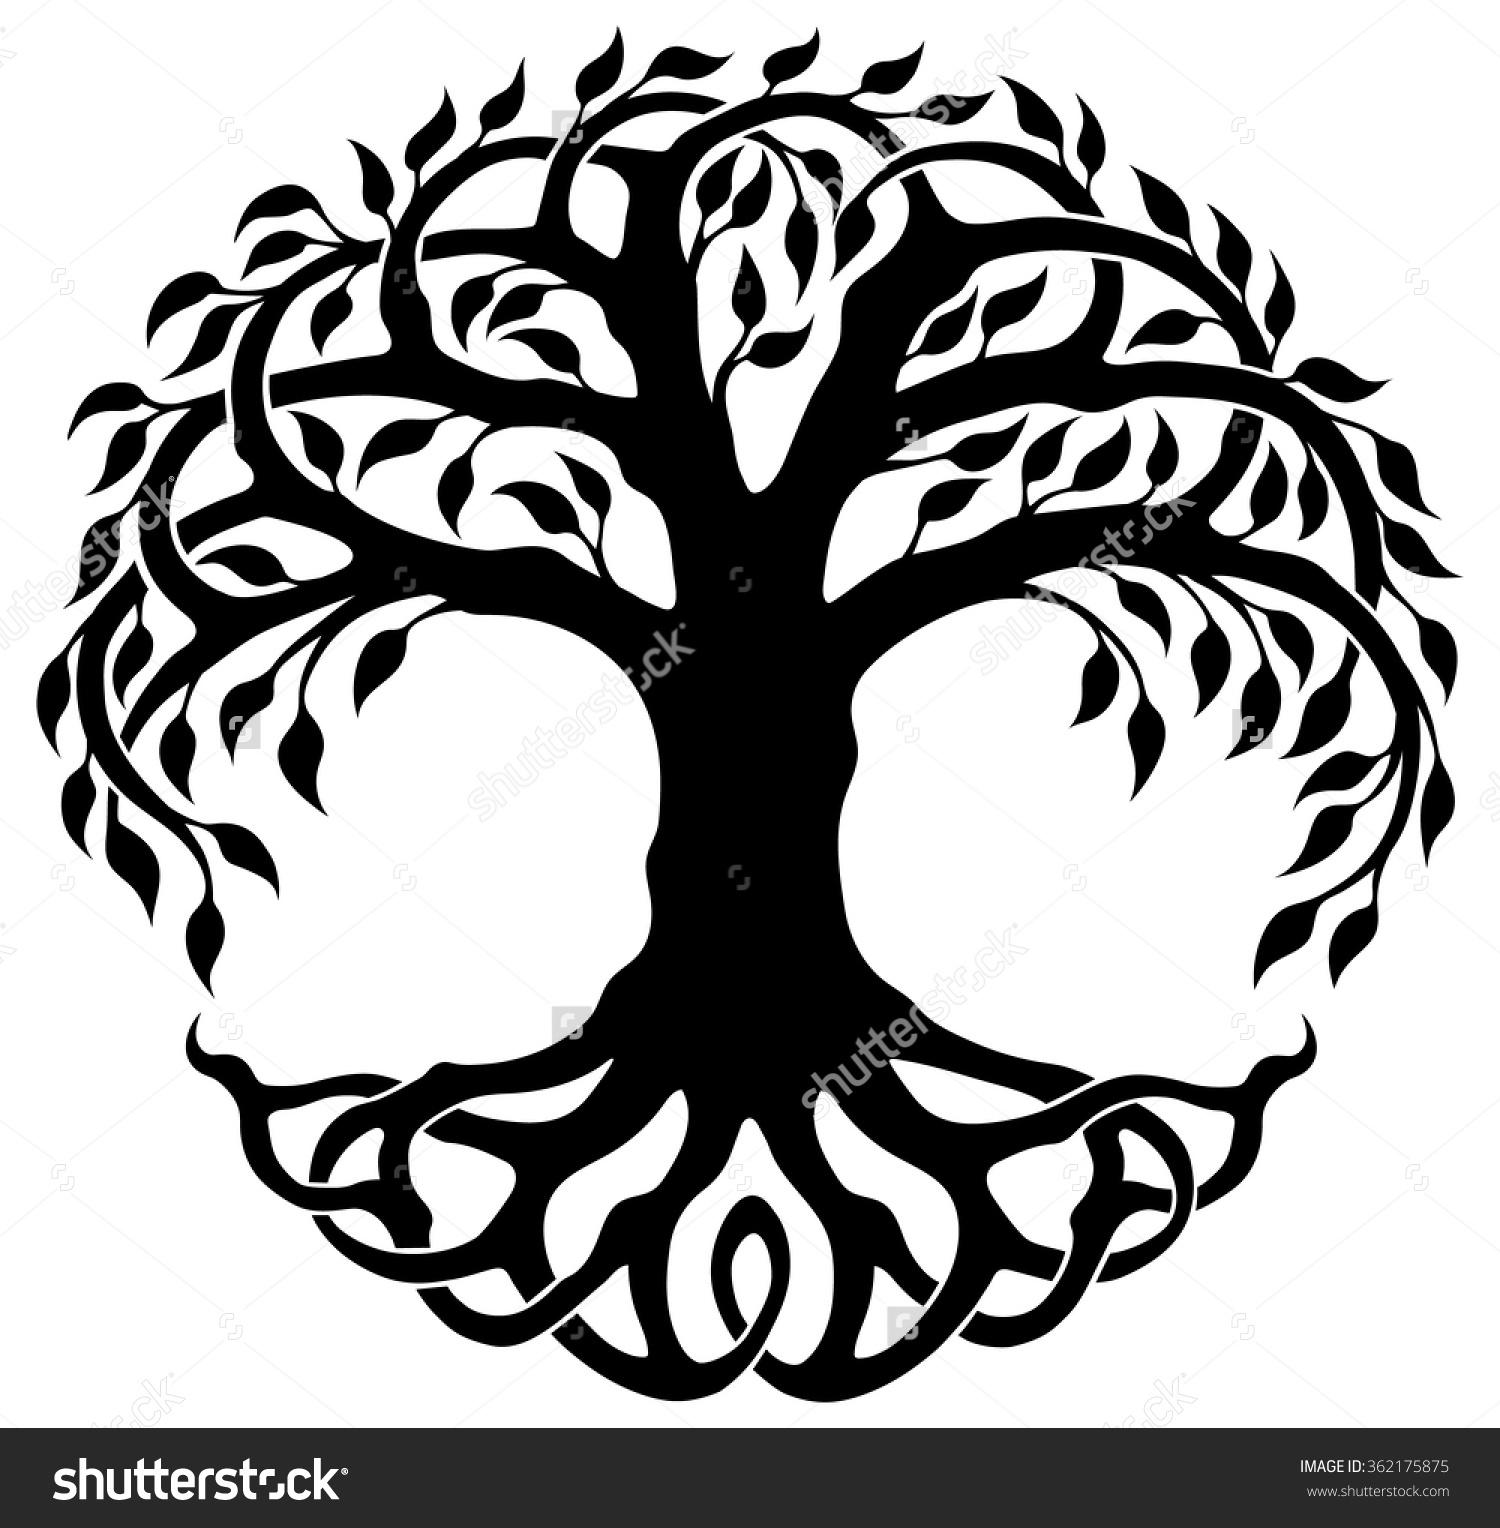 Celtic tree clipart vector jpg download Tree Of Life Clipart | Free download best Tree Of Life Clipart on ... jpg download